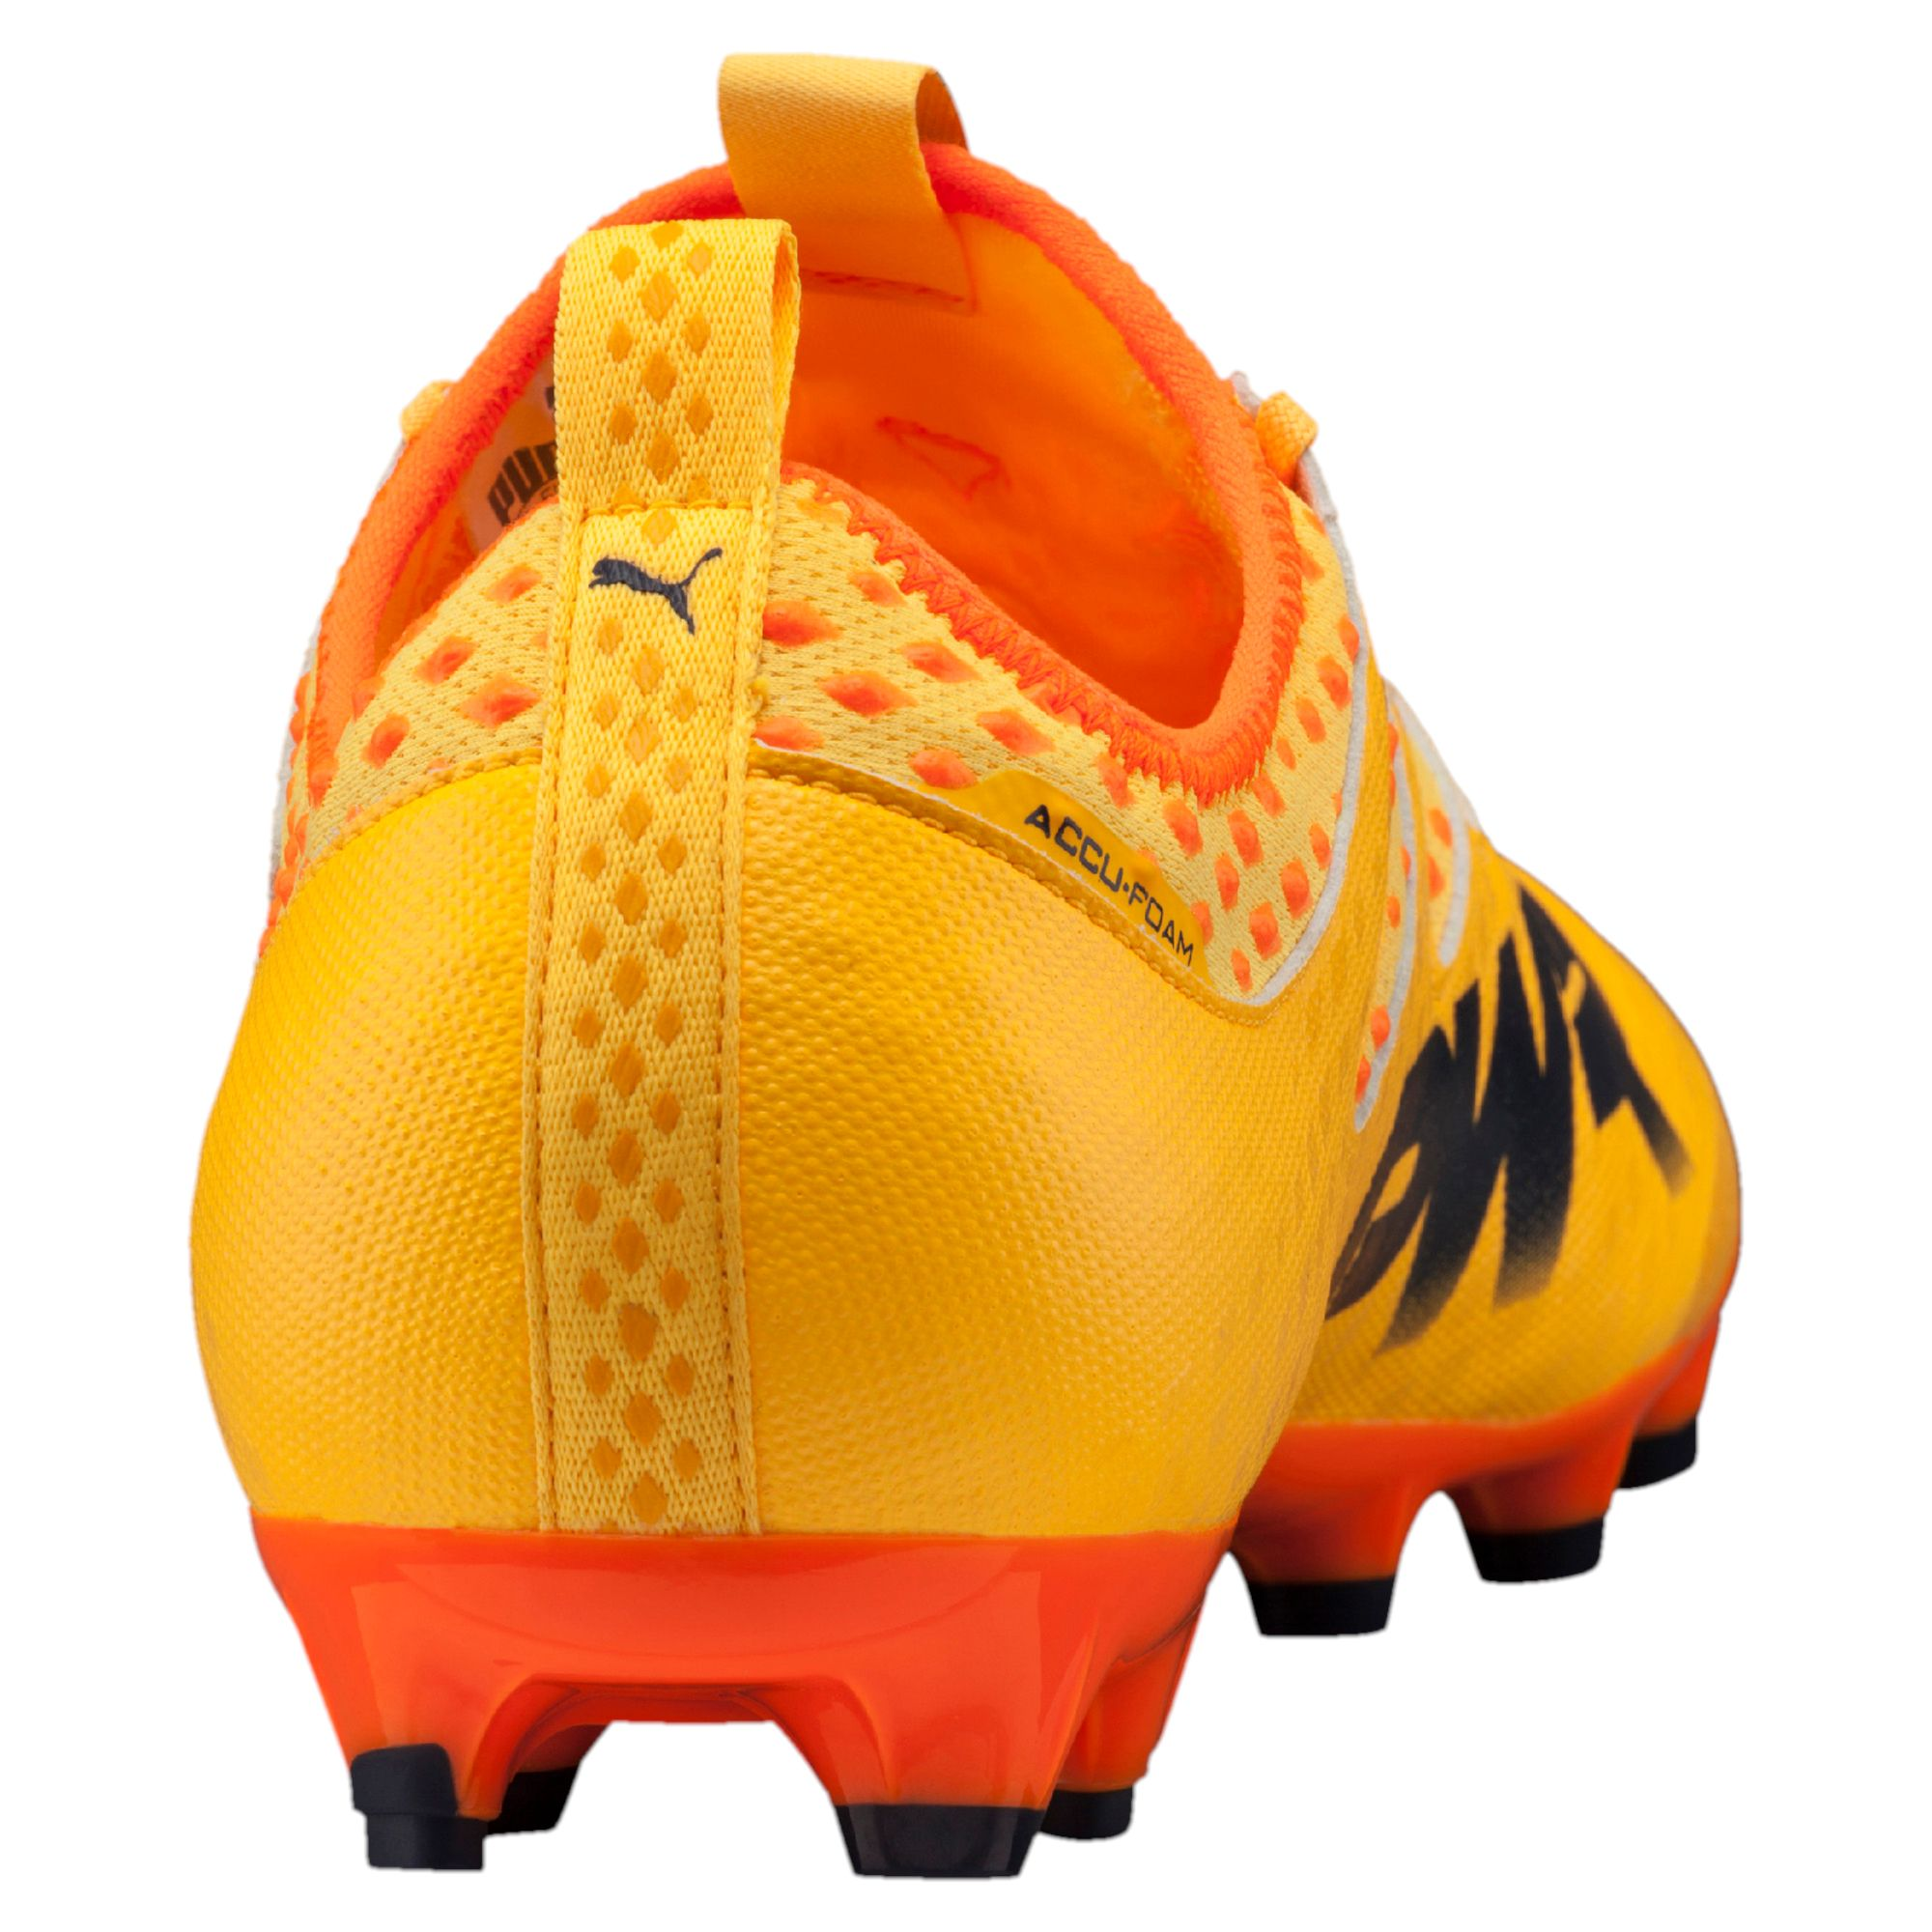 PUMA-evoPOWER-Vigor-2-AG-Men-s-Football-Boots-Hombre-Zapatos-Futbol-Nuevo miniatura 10